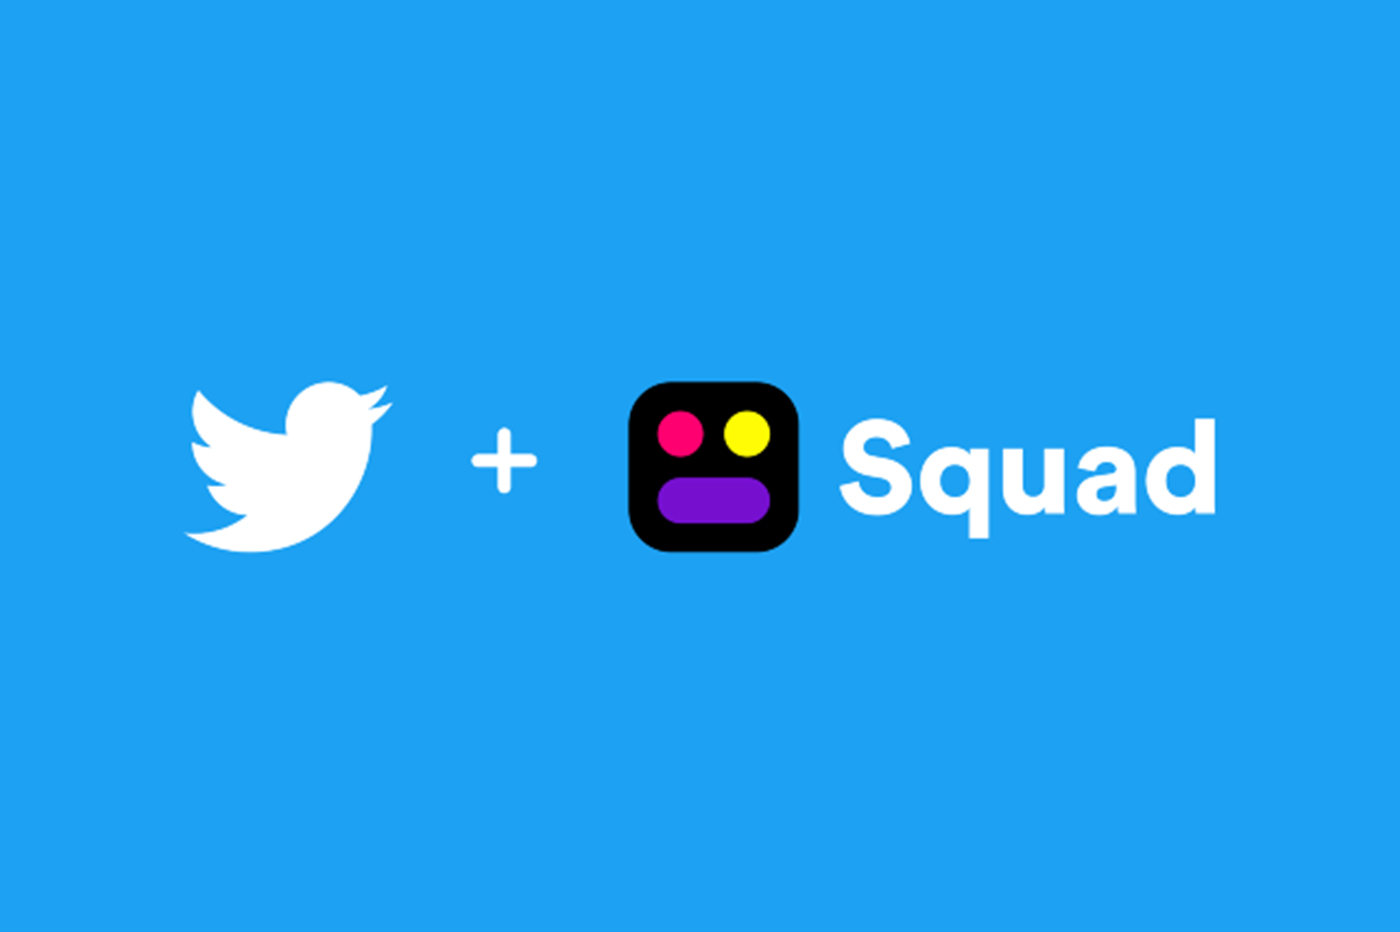 Twitter arrête sa plateforme de video en direct Periscope